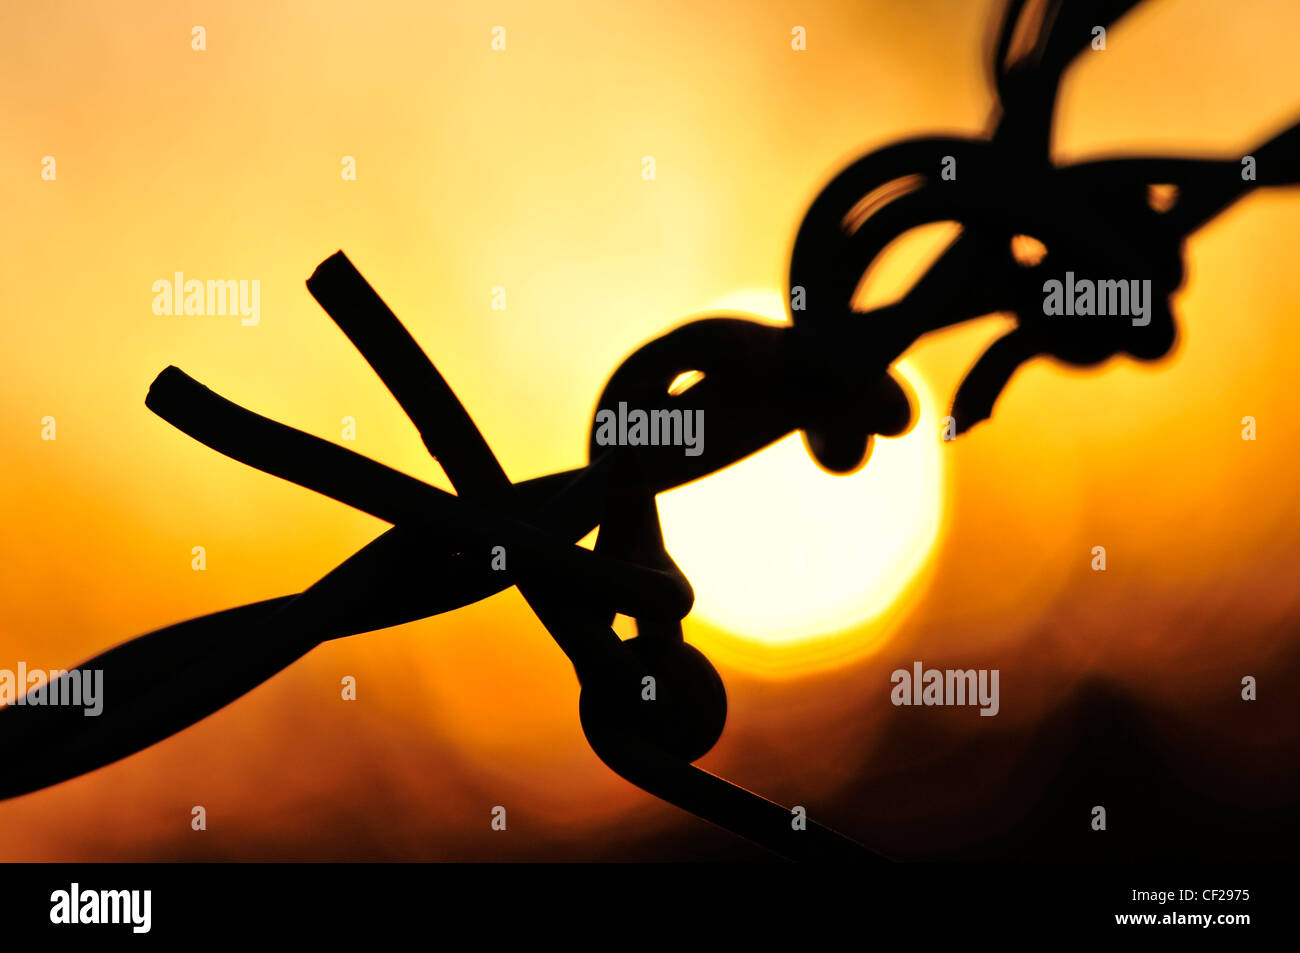 Barbed wire at sunset in Sahuarita, Arizona, USA. - Stock Image